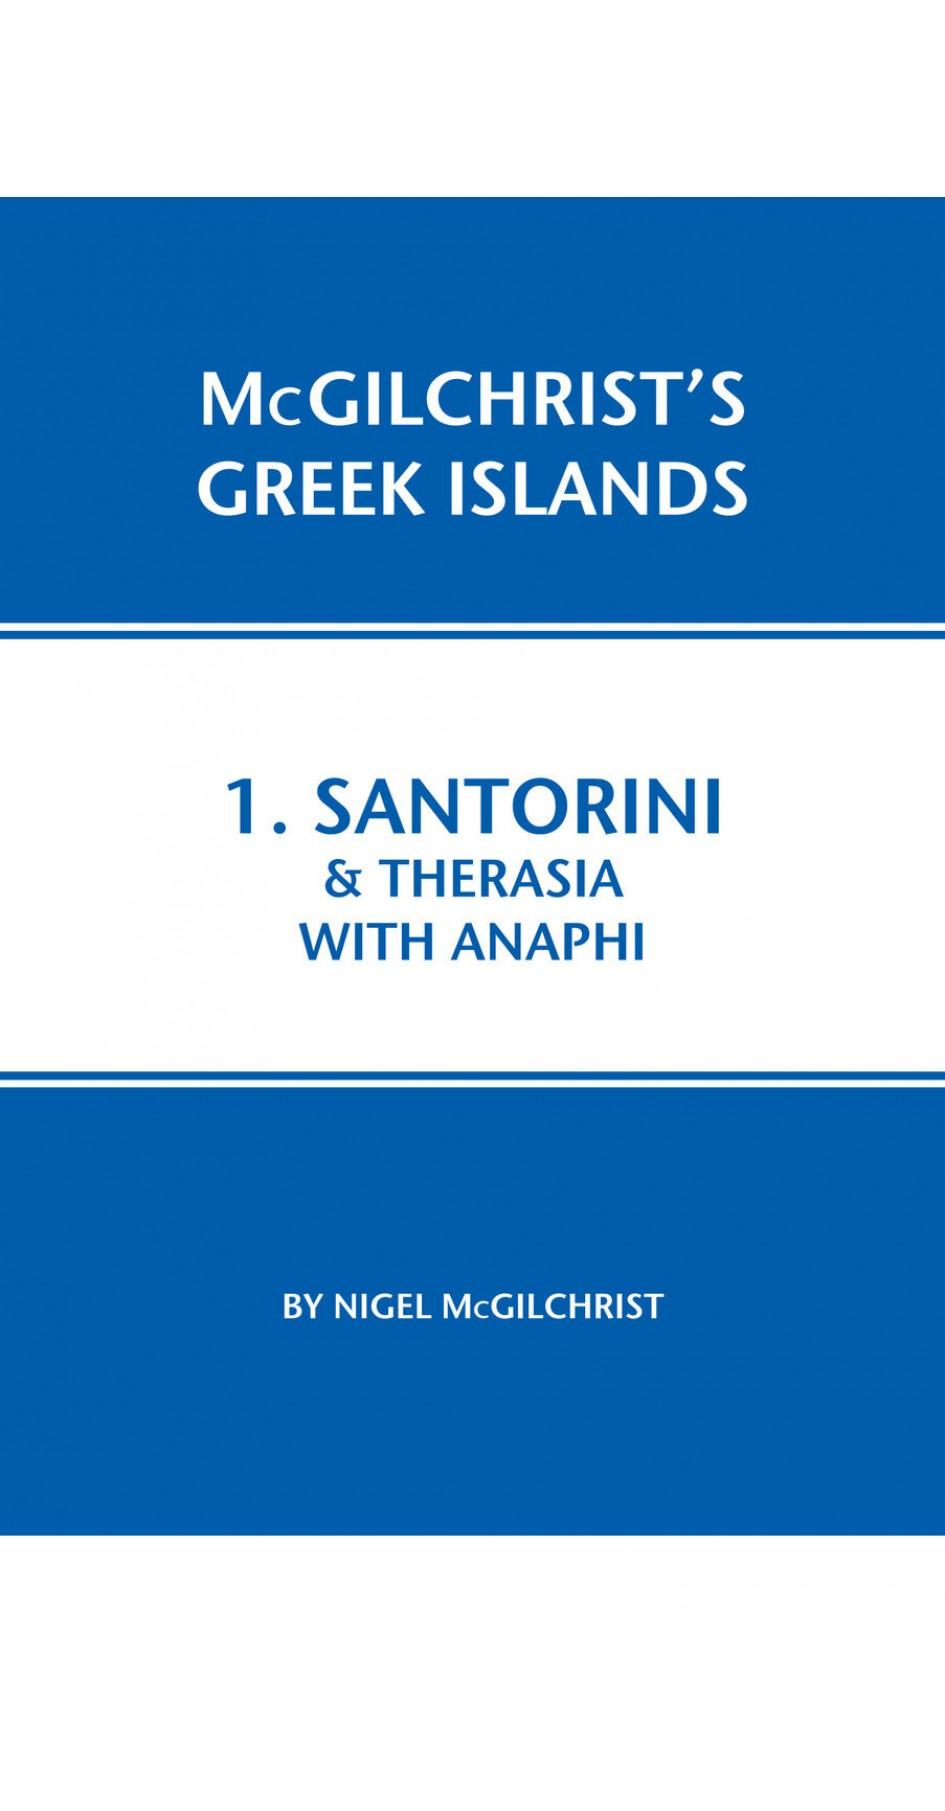 01. Santorini & Therasia with Anaphi - McGilchrist's Greek Islands